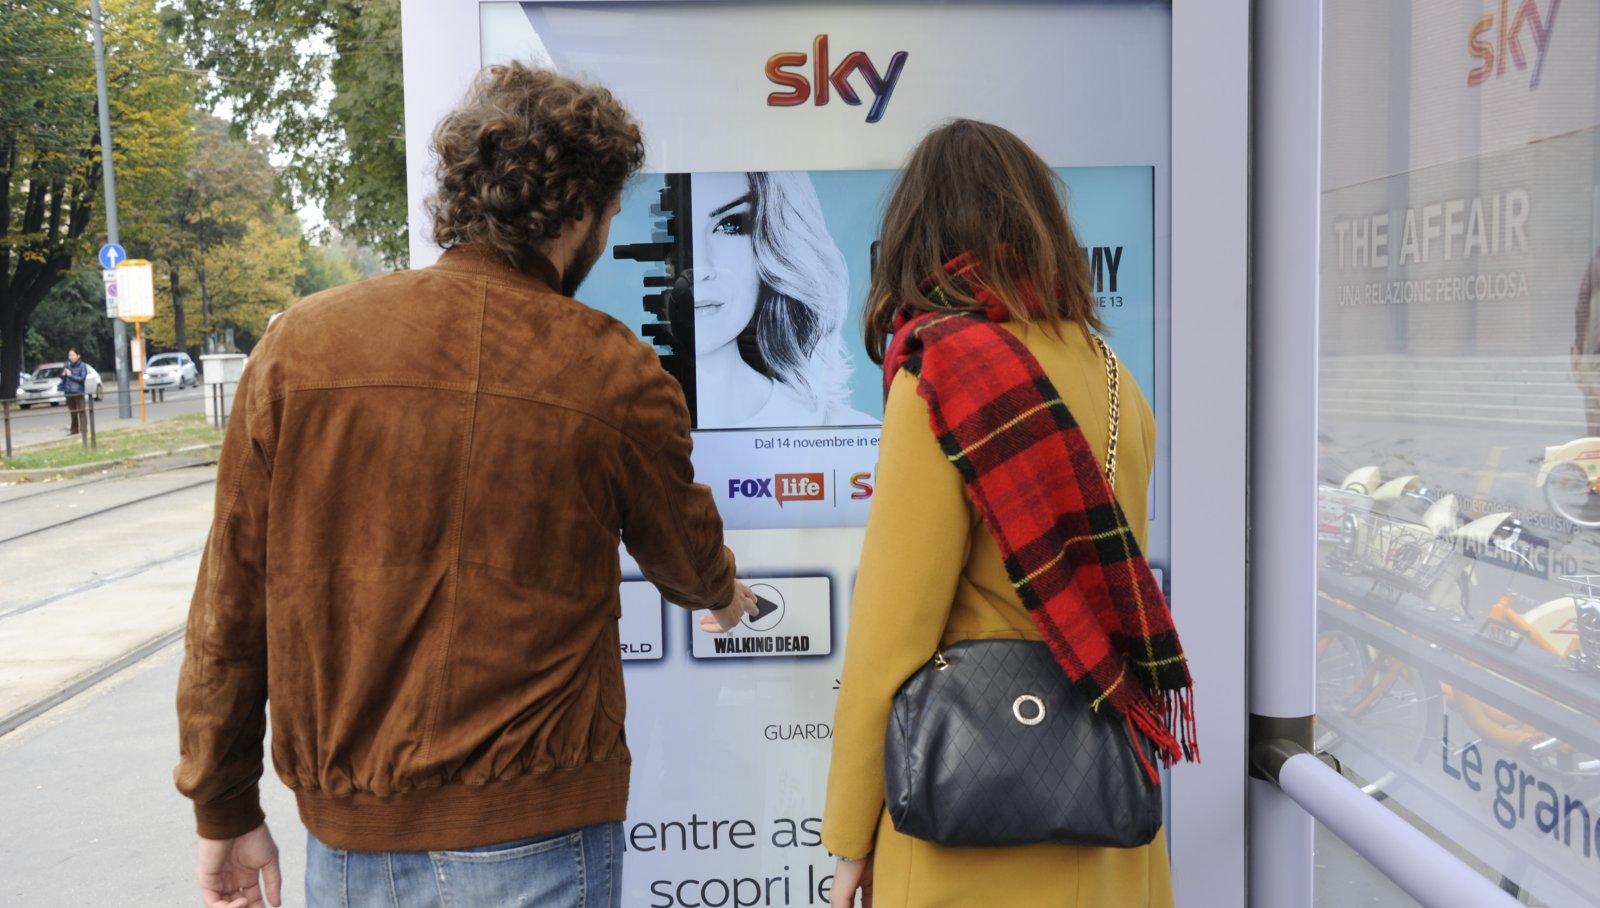 Pubblicità Out Of Home Milano showcase pensilina IGPDecaux per Sky